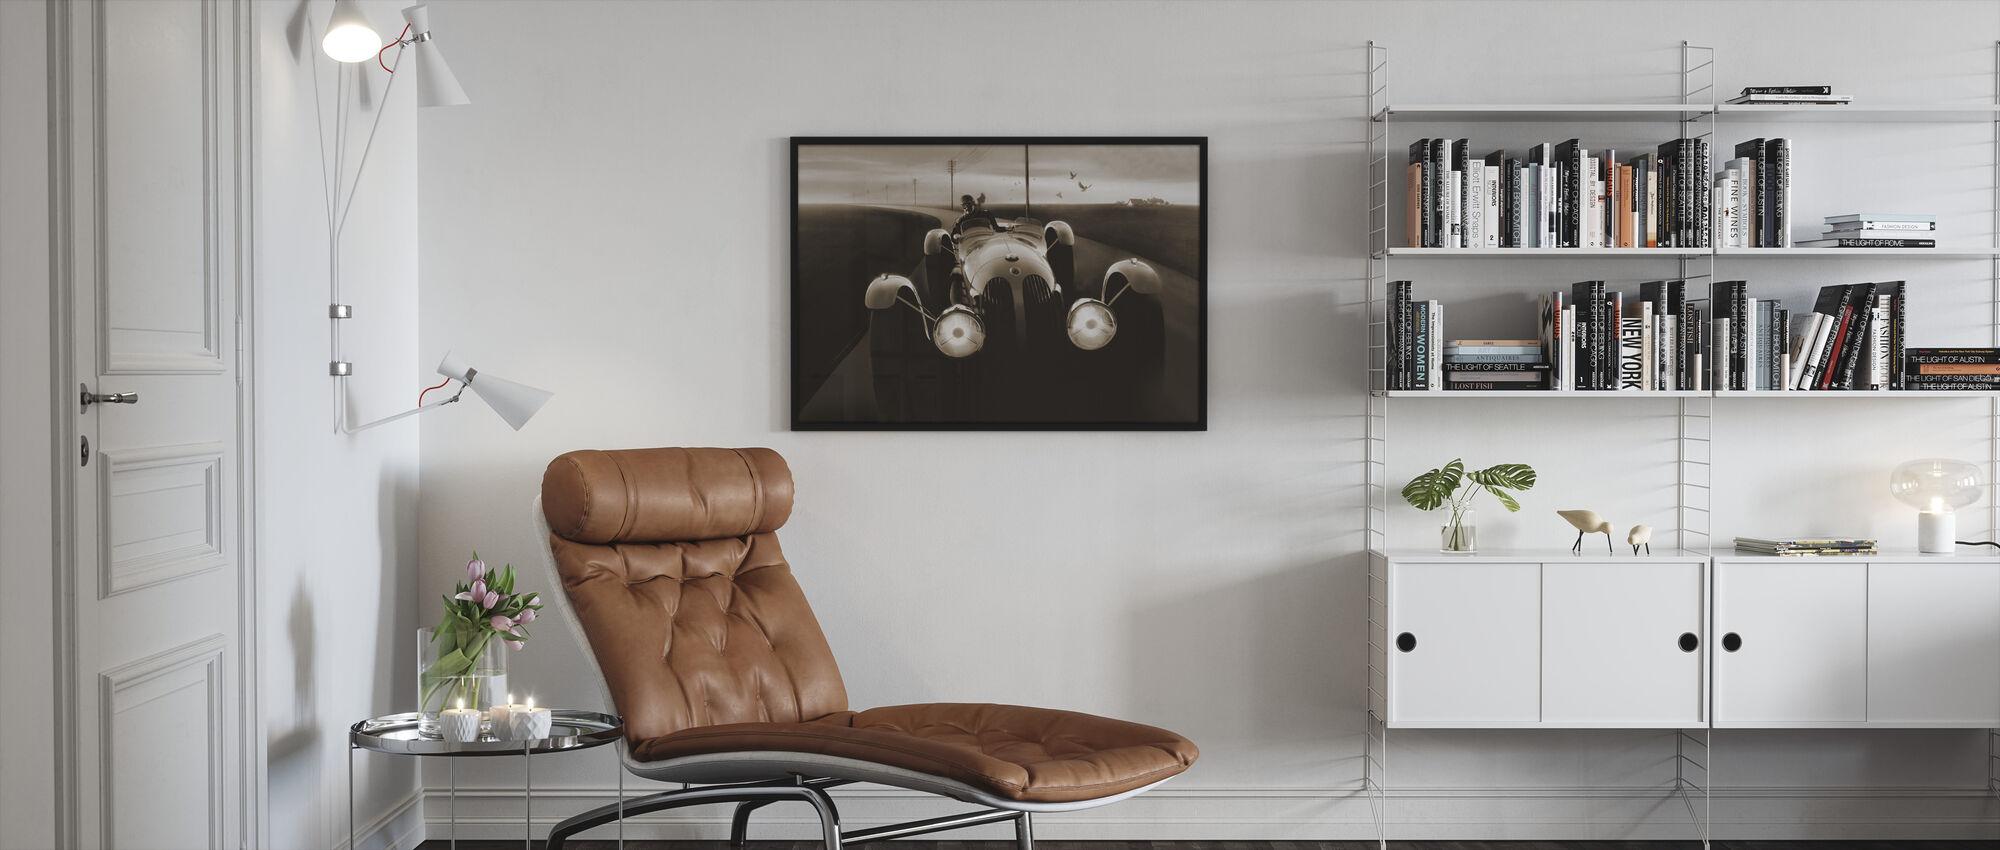 Templars Hirondel Sepia - Framed print - Living Room